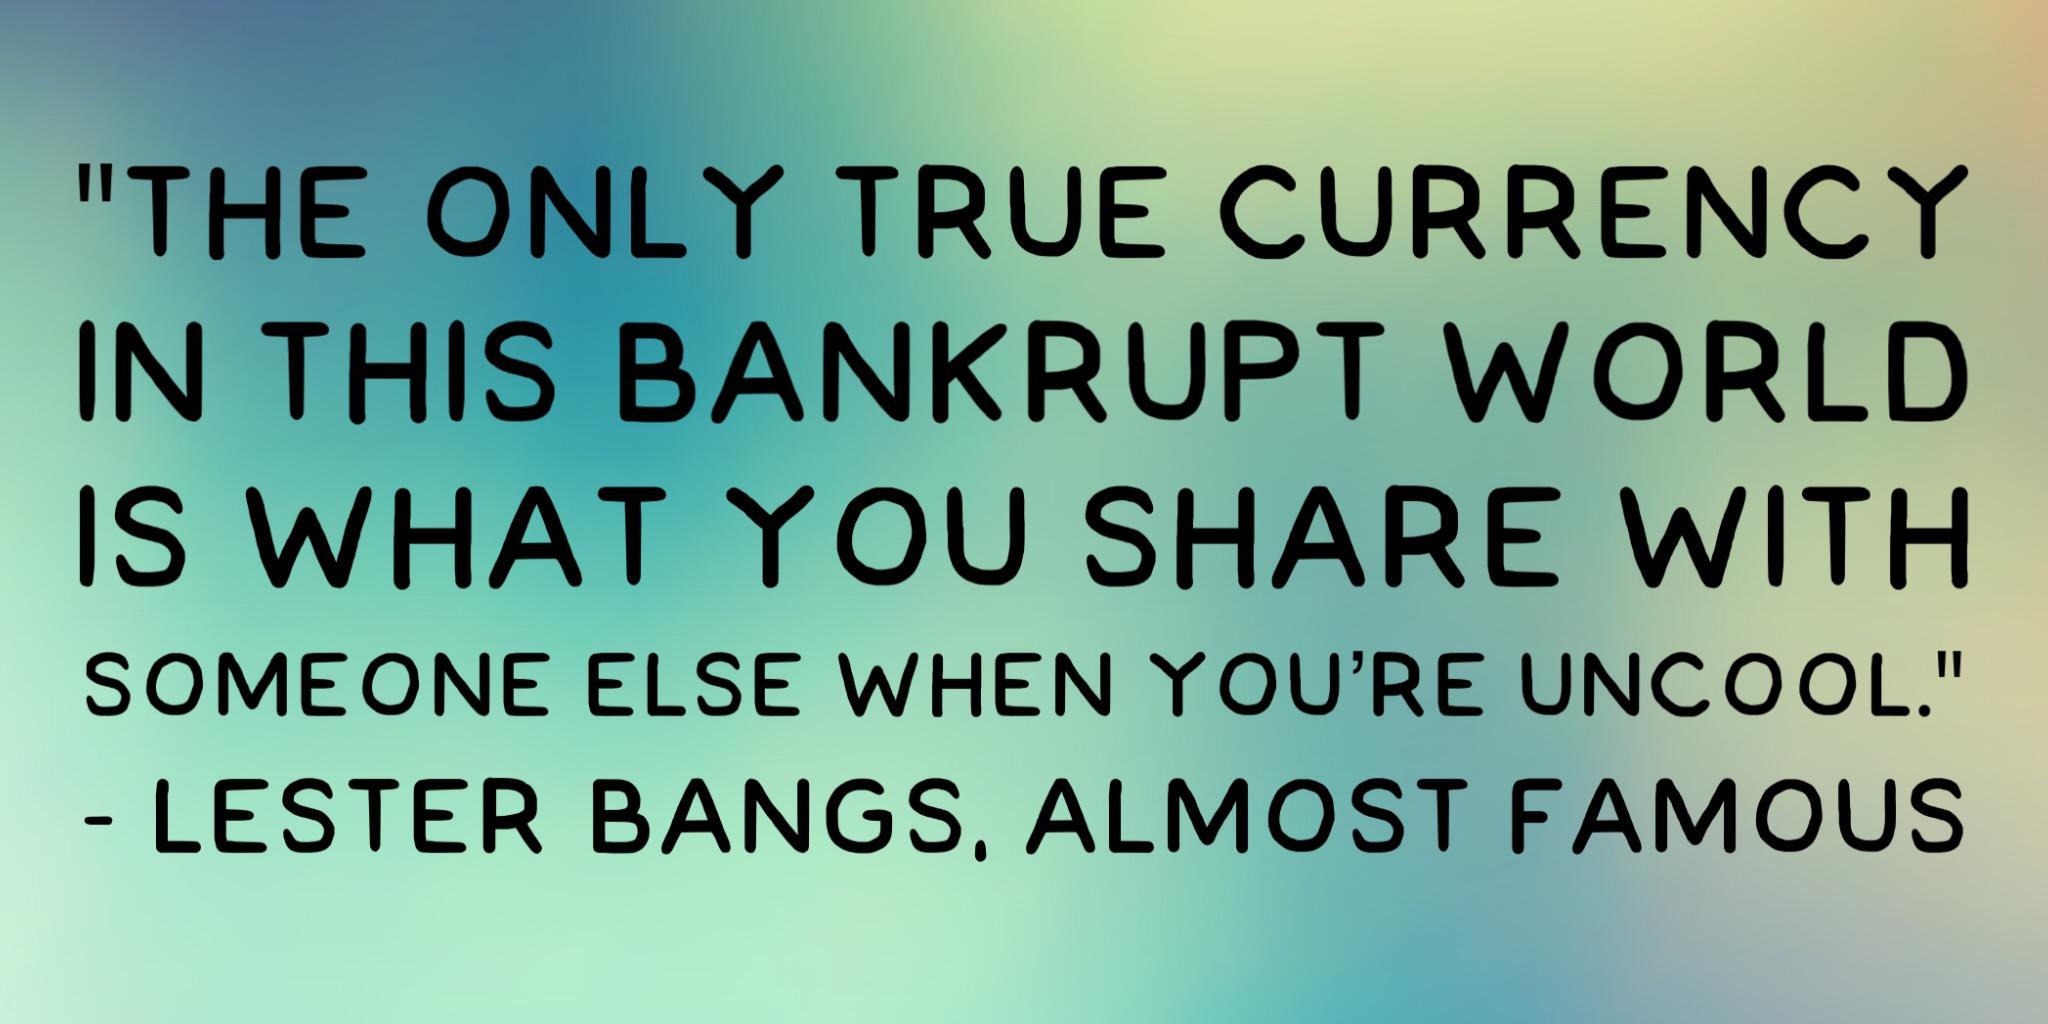 True Currency